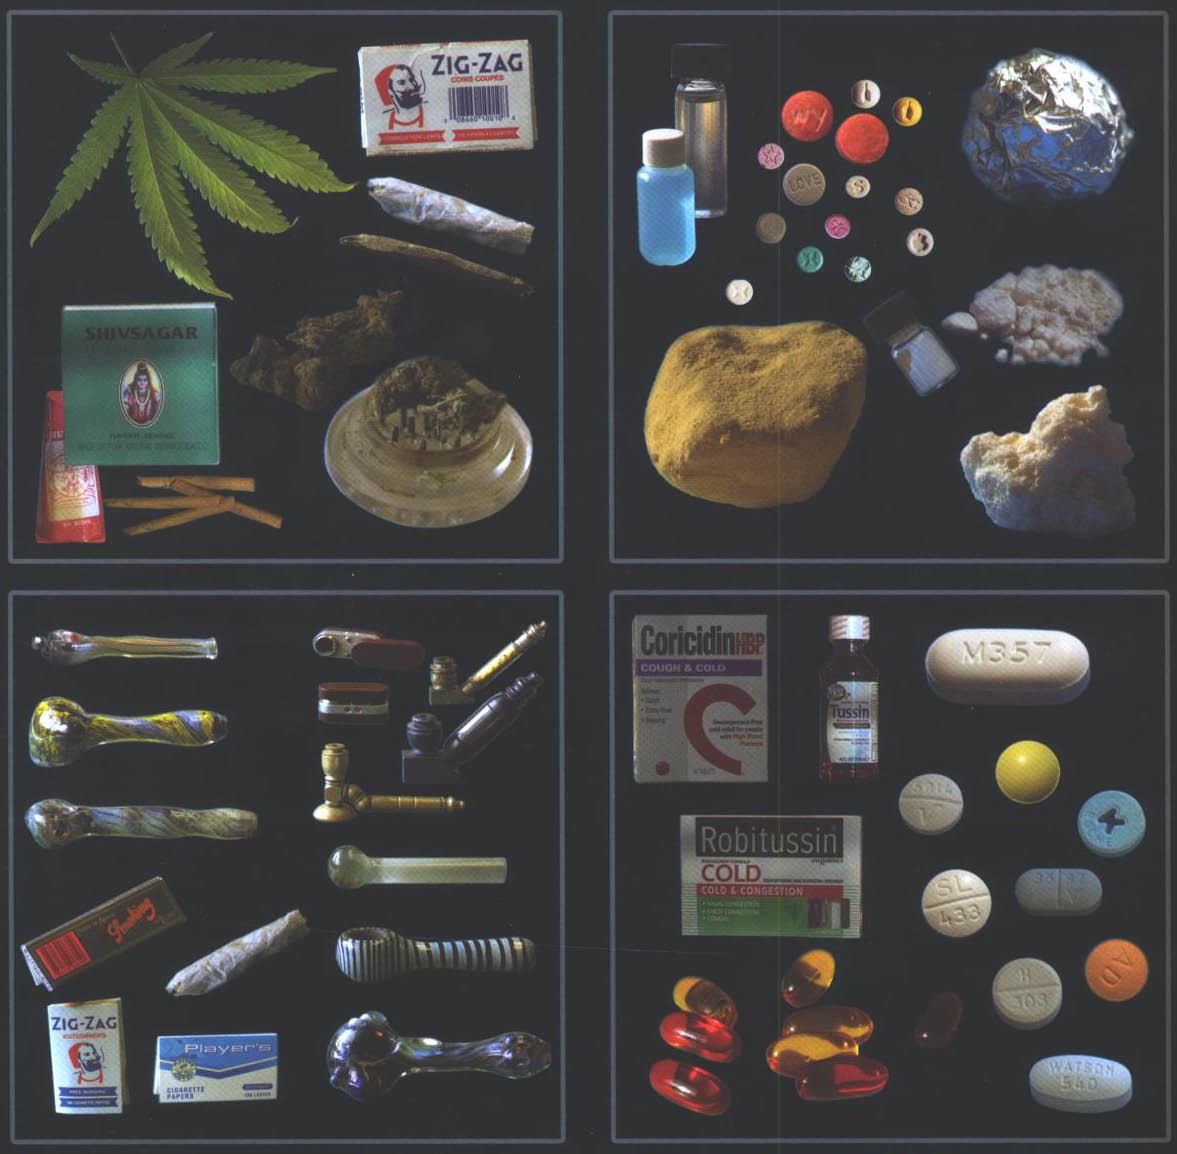 Contoh Proposal Penyuluhan Narkoba Smp Laporan Pelaksanaan Kegiatan Sosialisasi Narkoba Proposal Penyuluhan Narkotika Irwan Graves Law